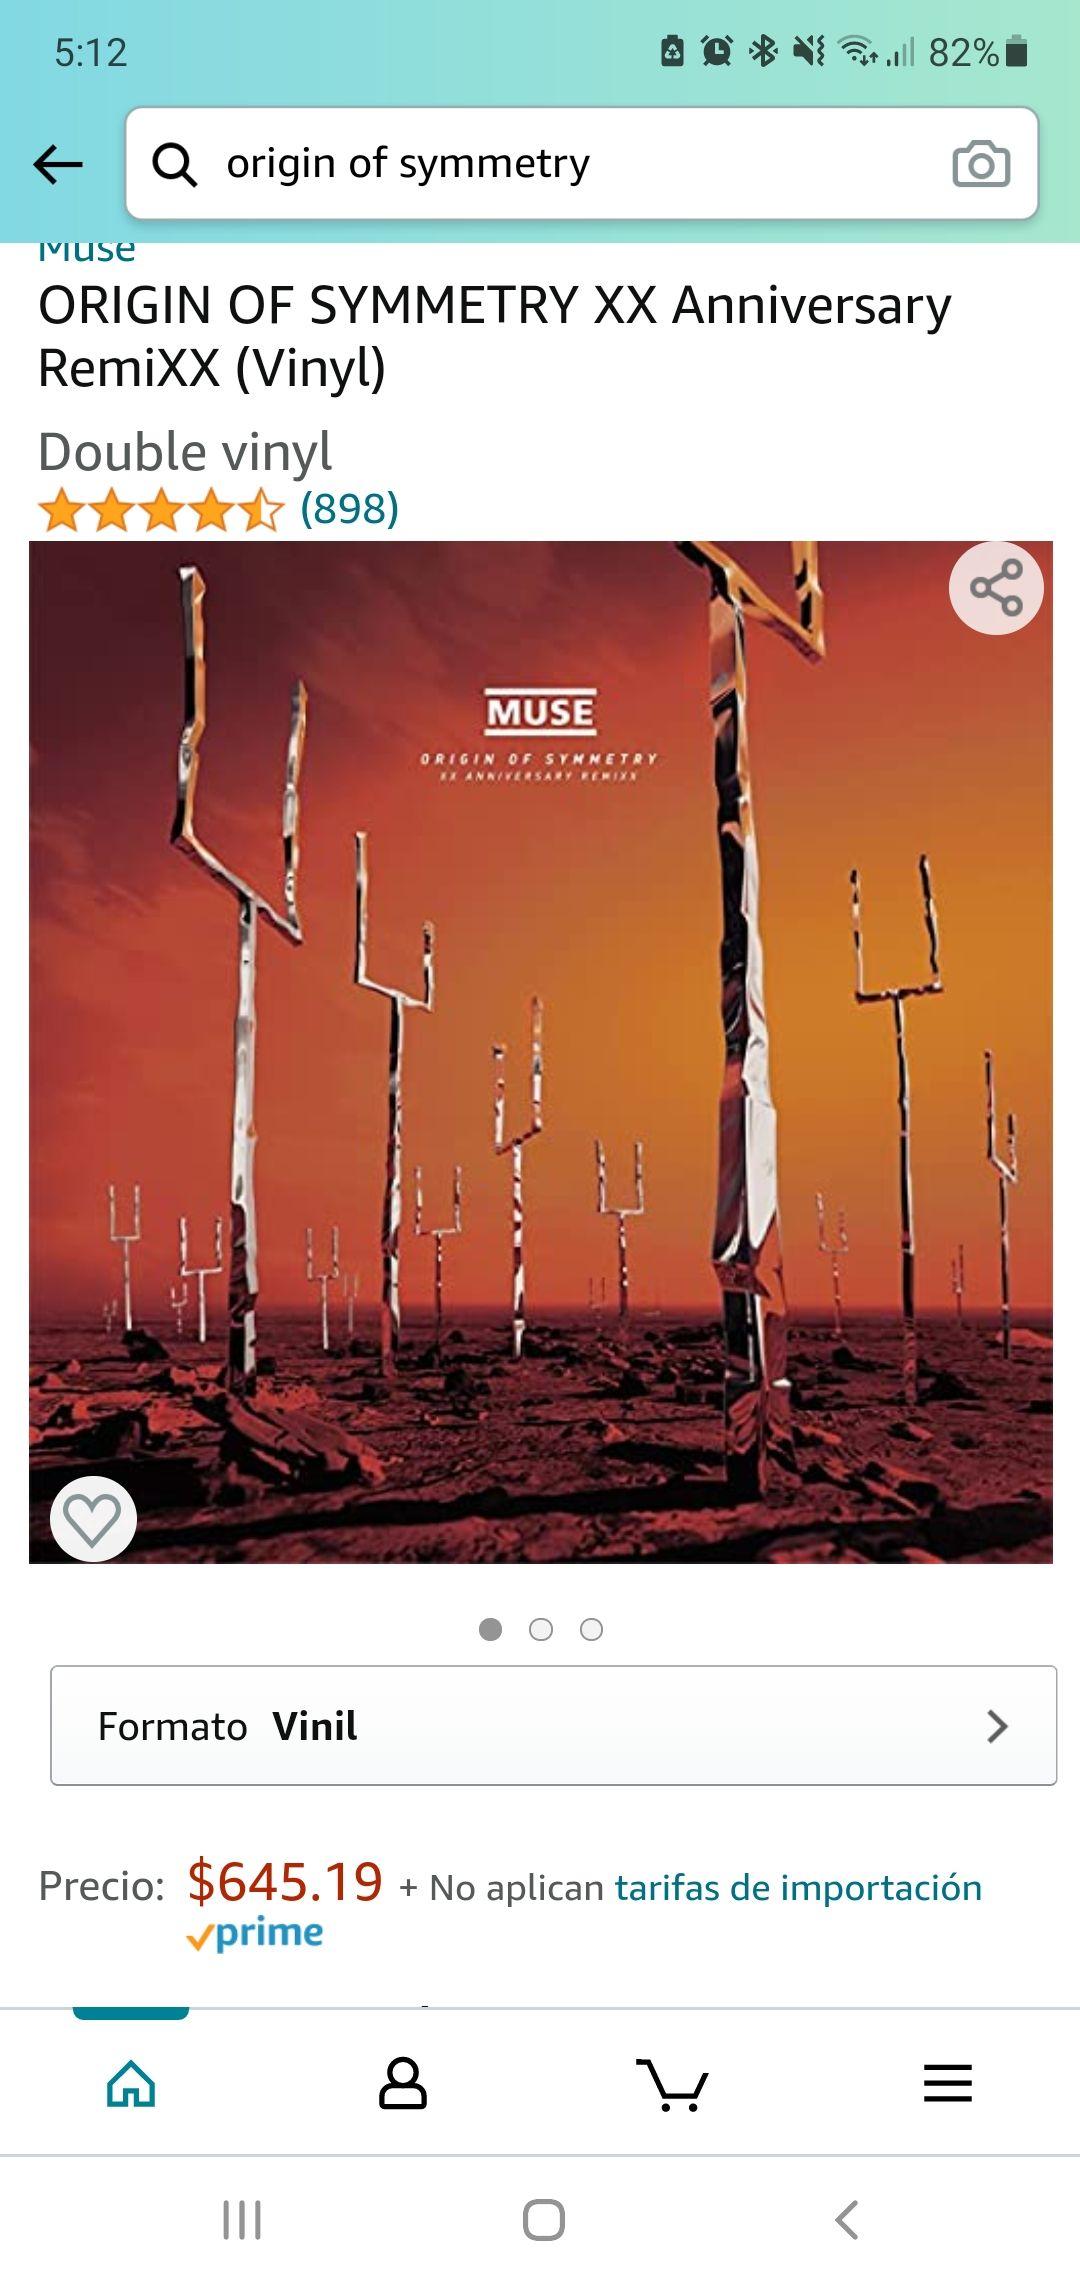 AMAZON: Muse ORIGIN OF SYMMETRY XX Anniversary RemiXX (Vinyl)